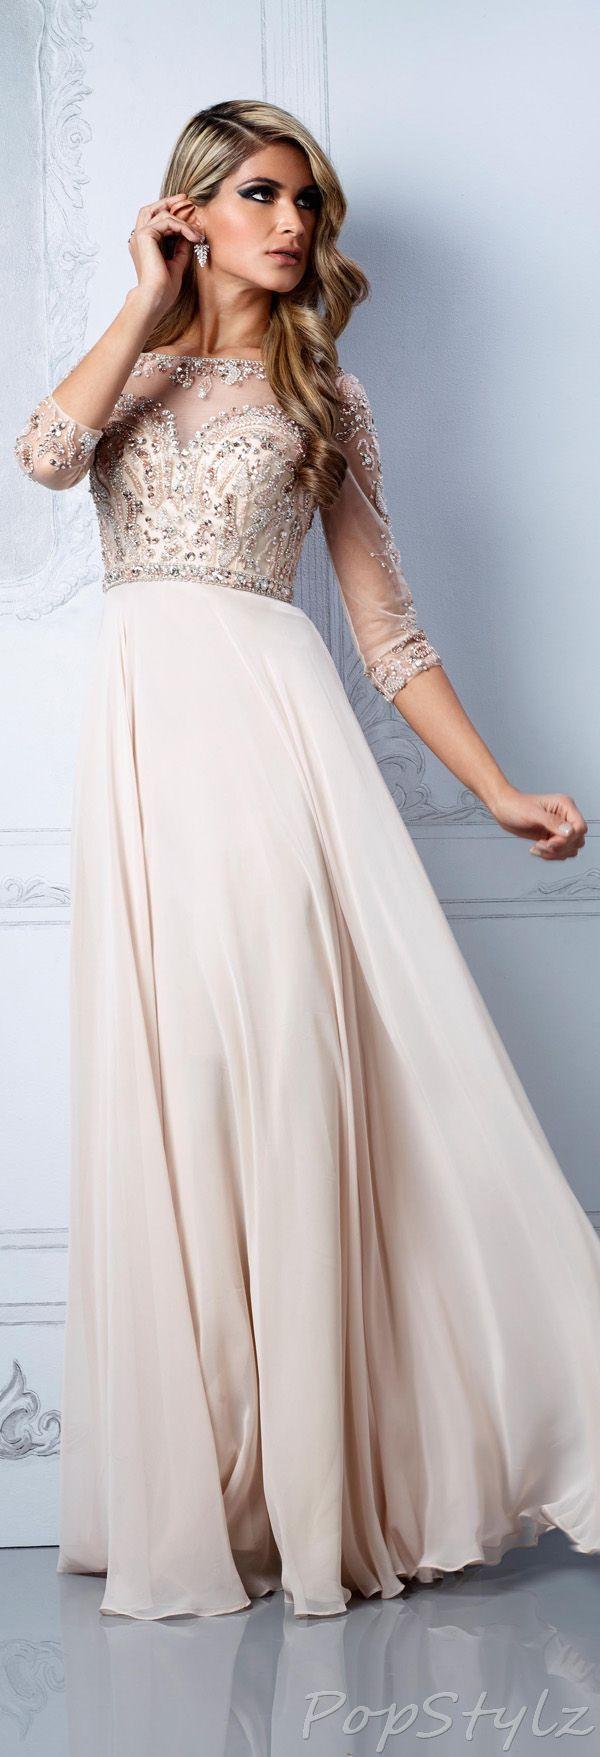 Stunning dress find more women fashion ideas on misspool